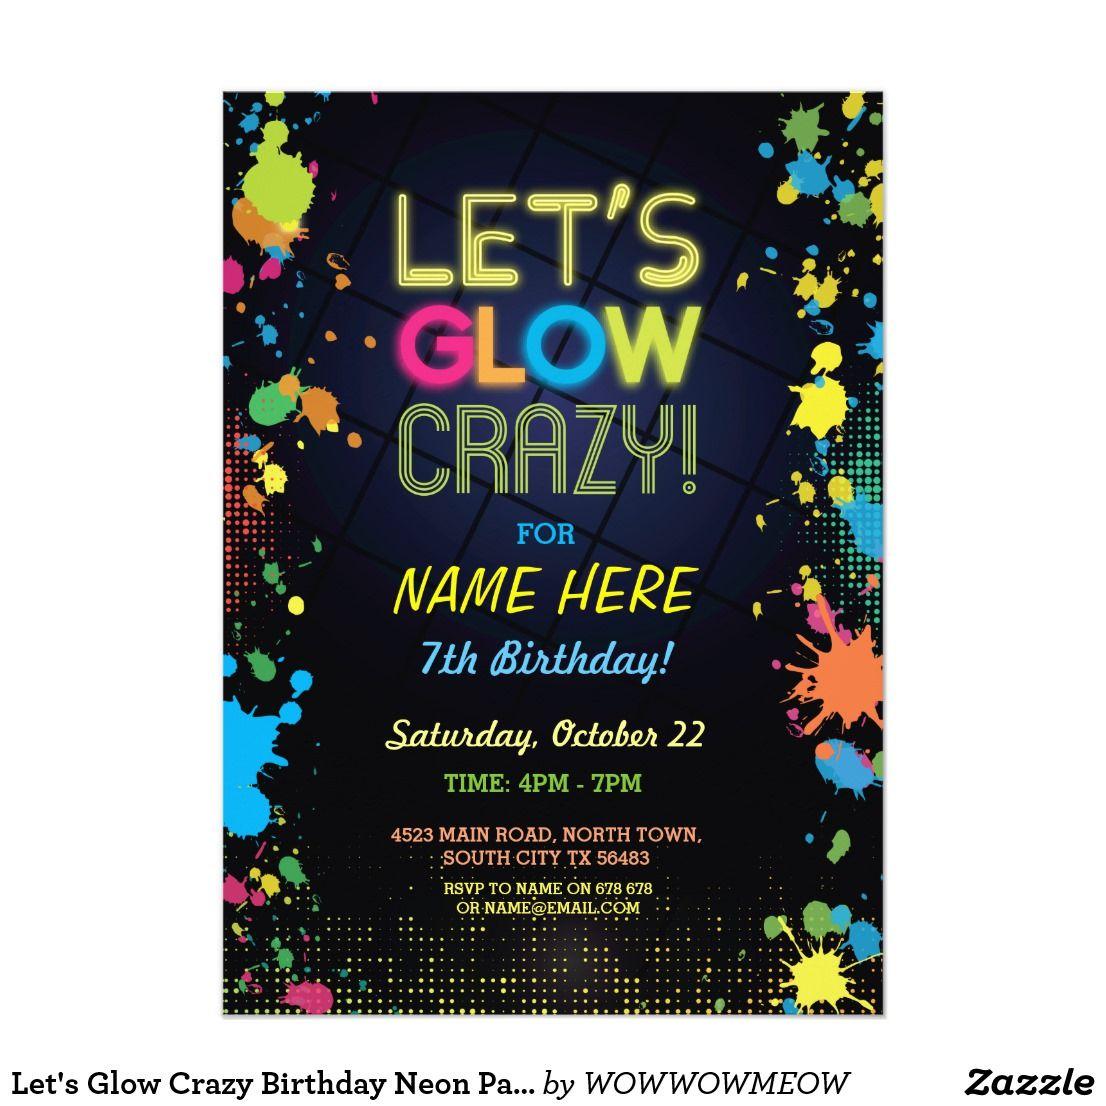 Let's Glow Invitations